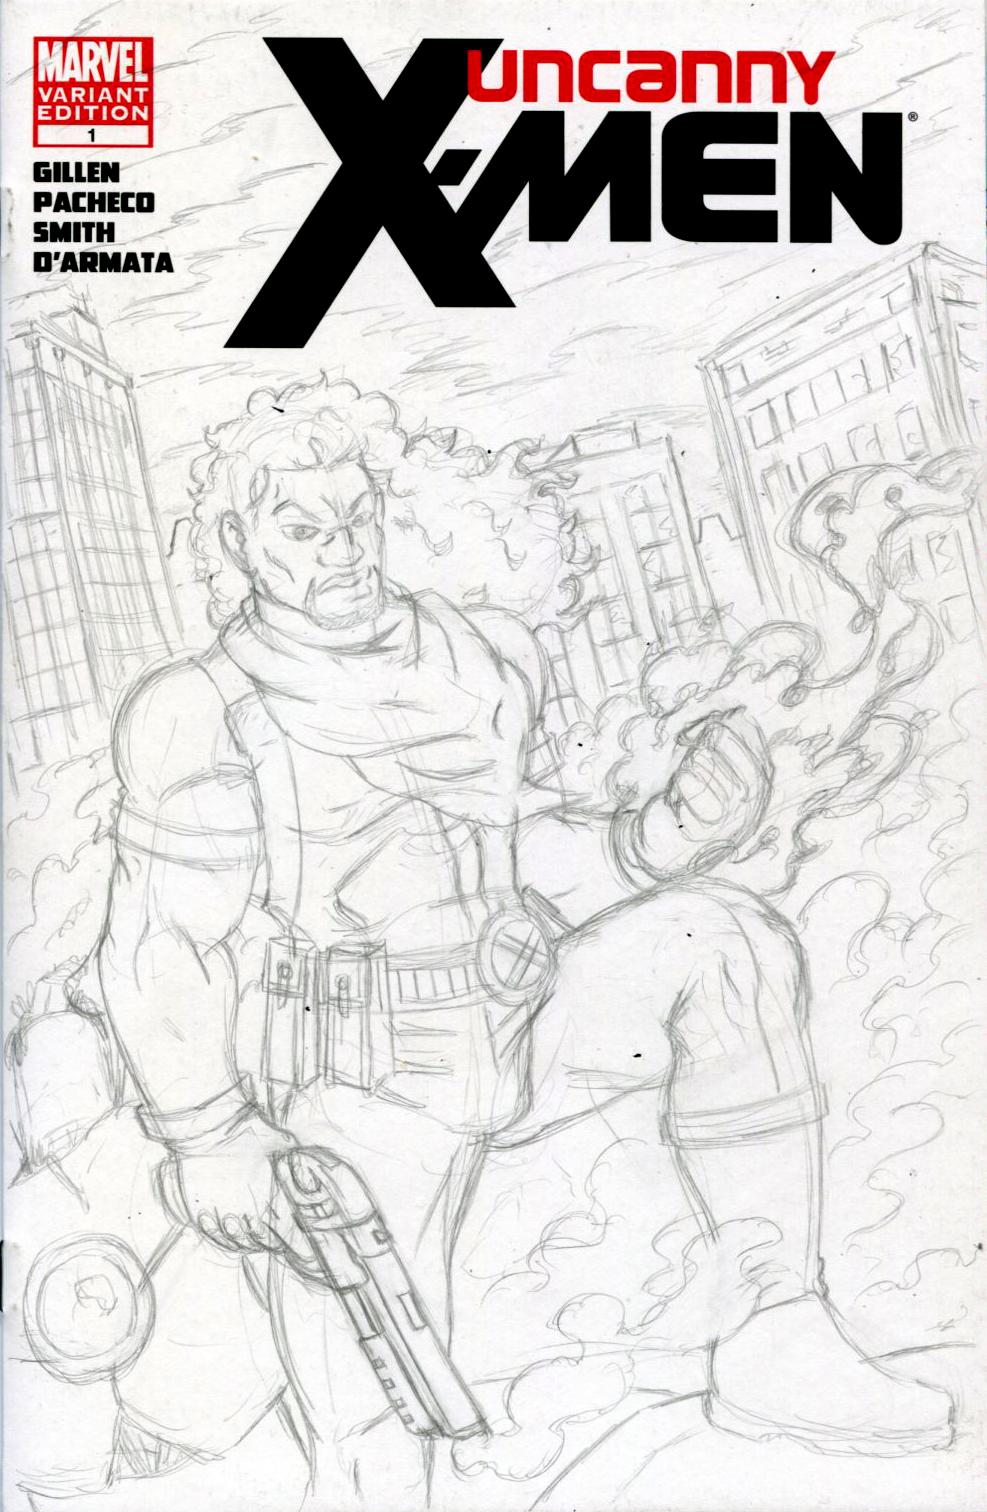 Bishop Uncanny X-Men Sketch Cover Pencils by ibroussardart